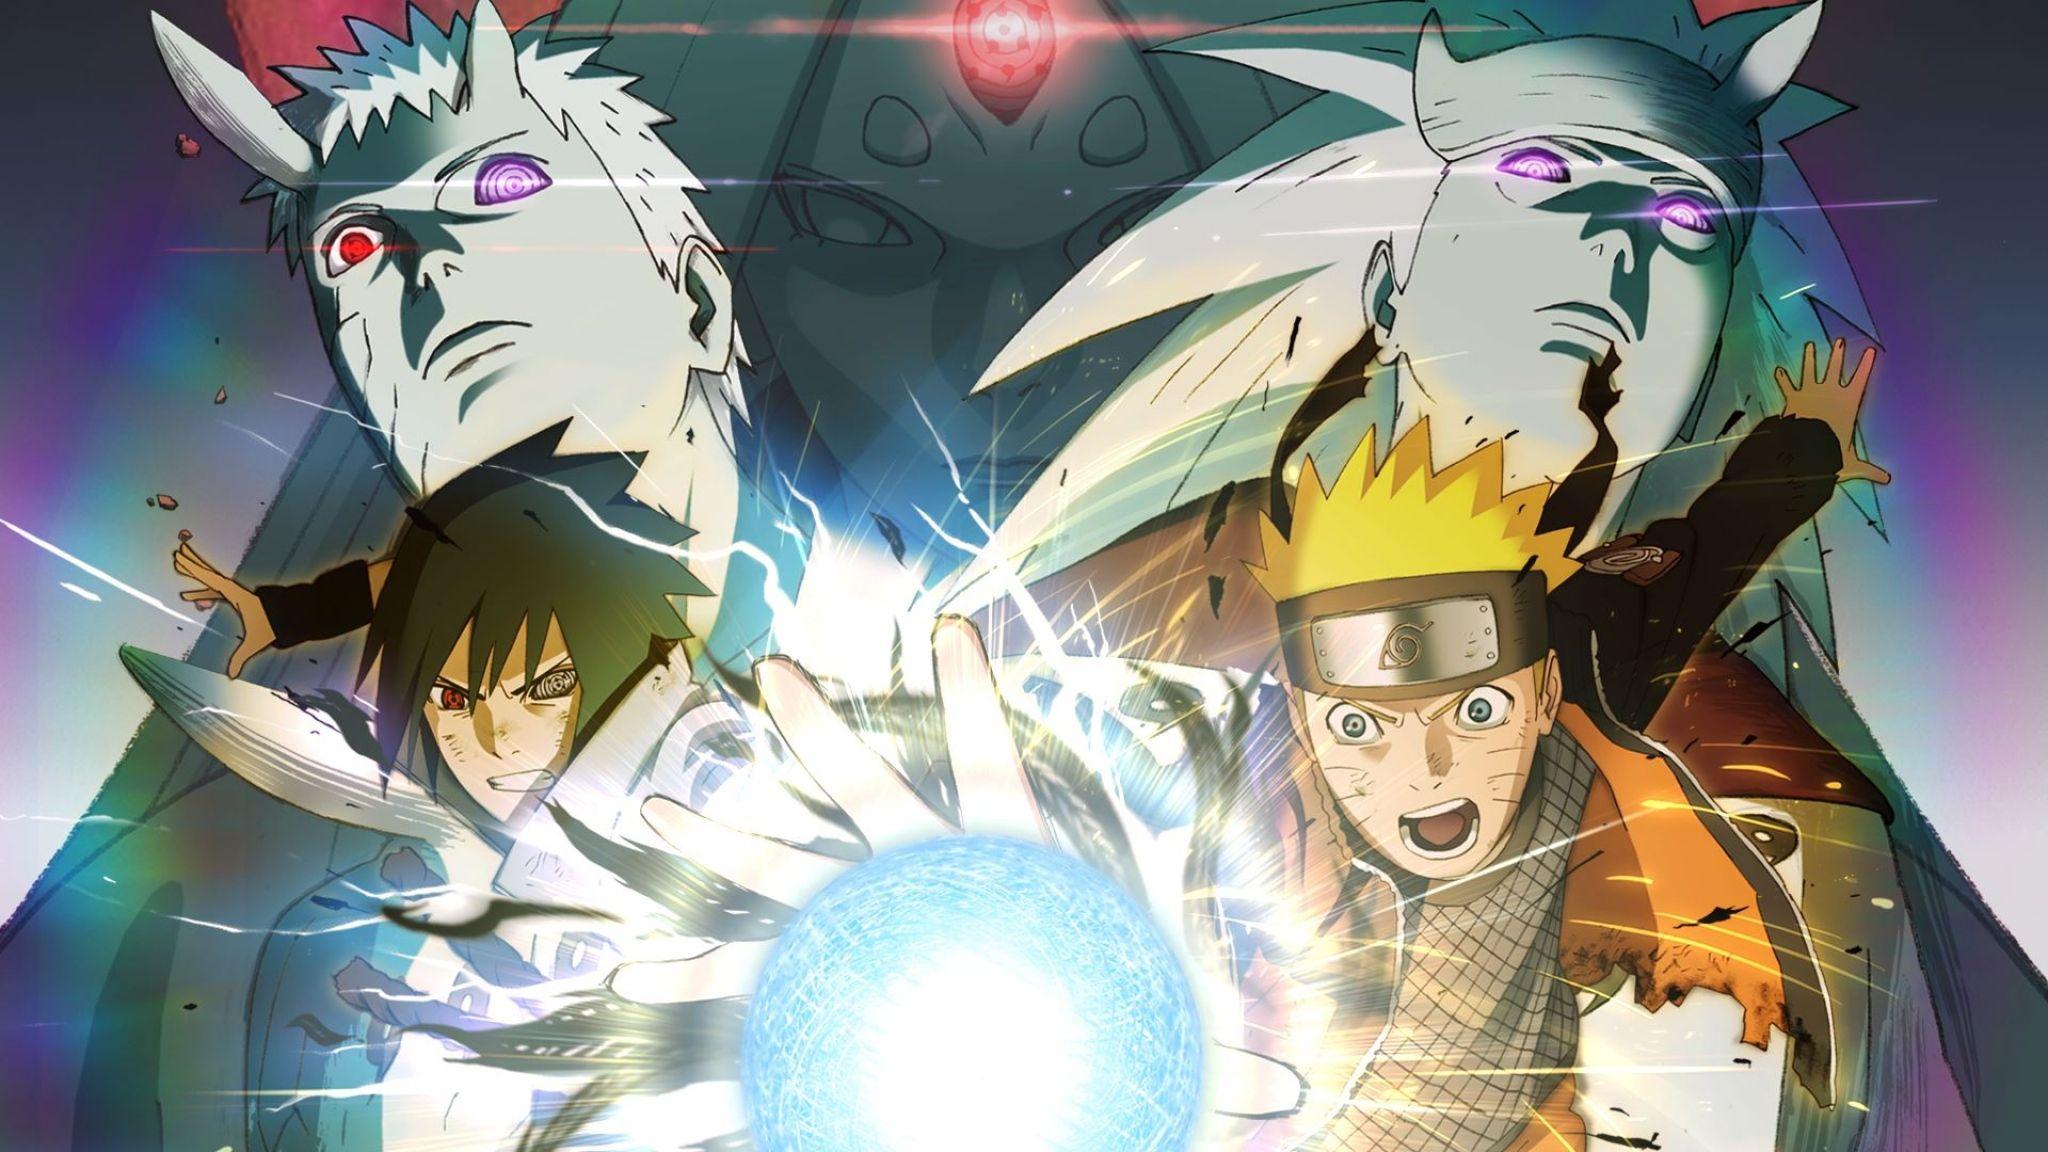 Oneshots Anime YouTuber Manga Naruto t Naruto